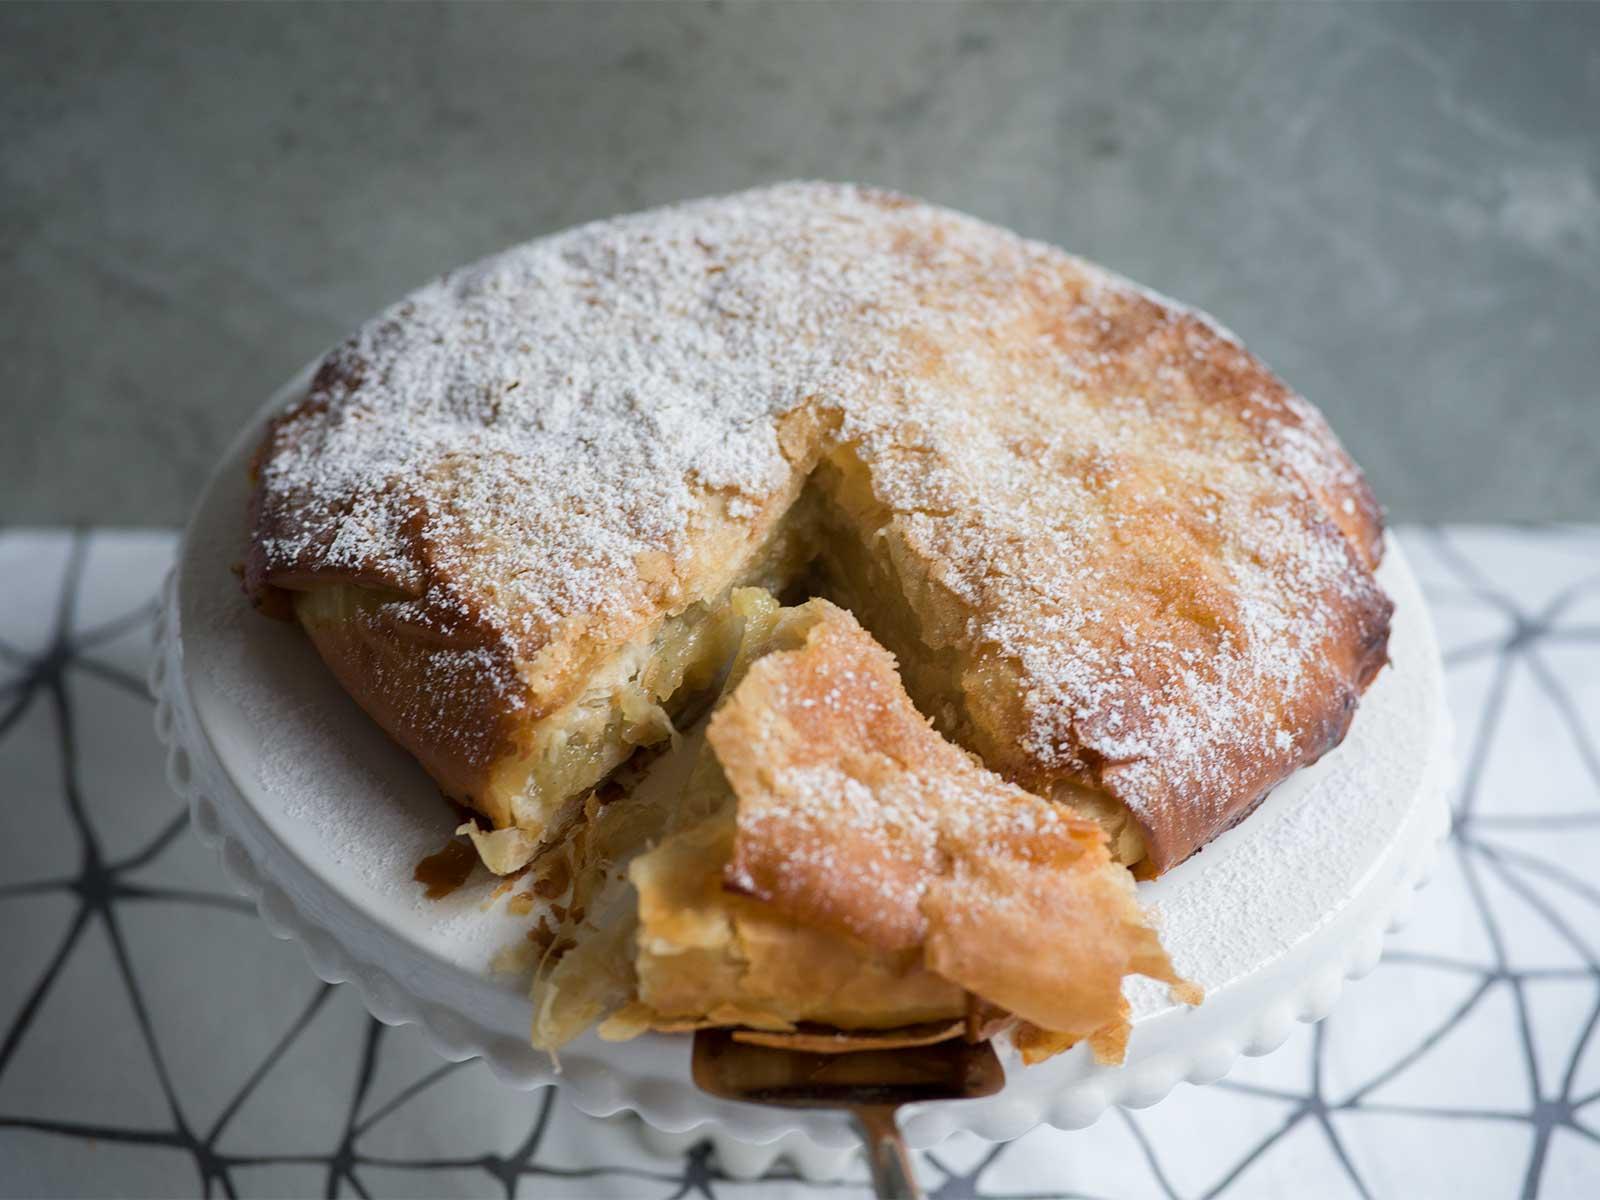 apple and cinnamon wrapped in filo pastry   Apple Pastilla